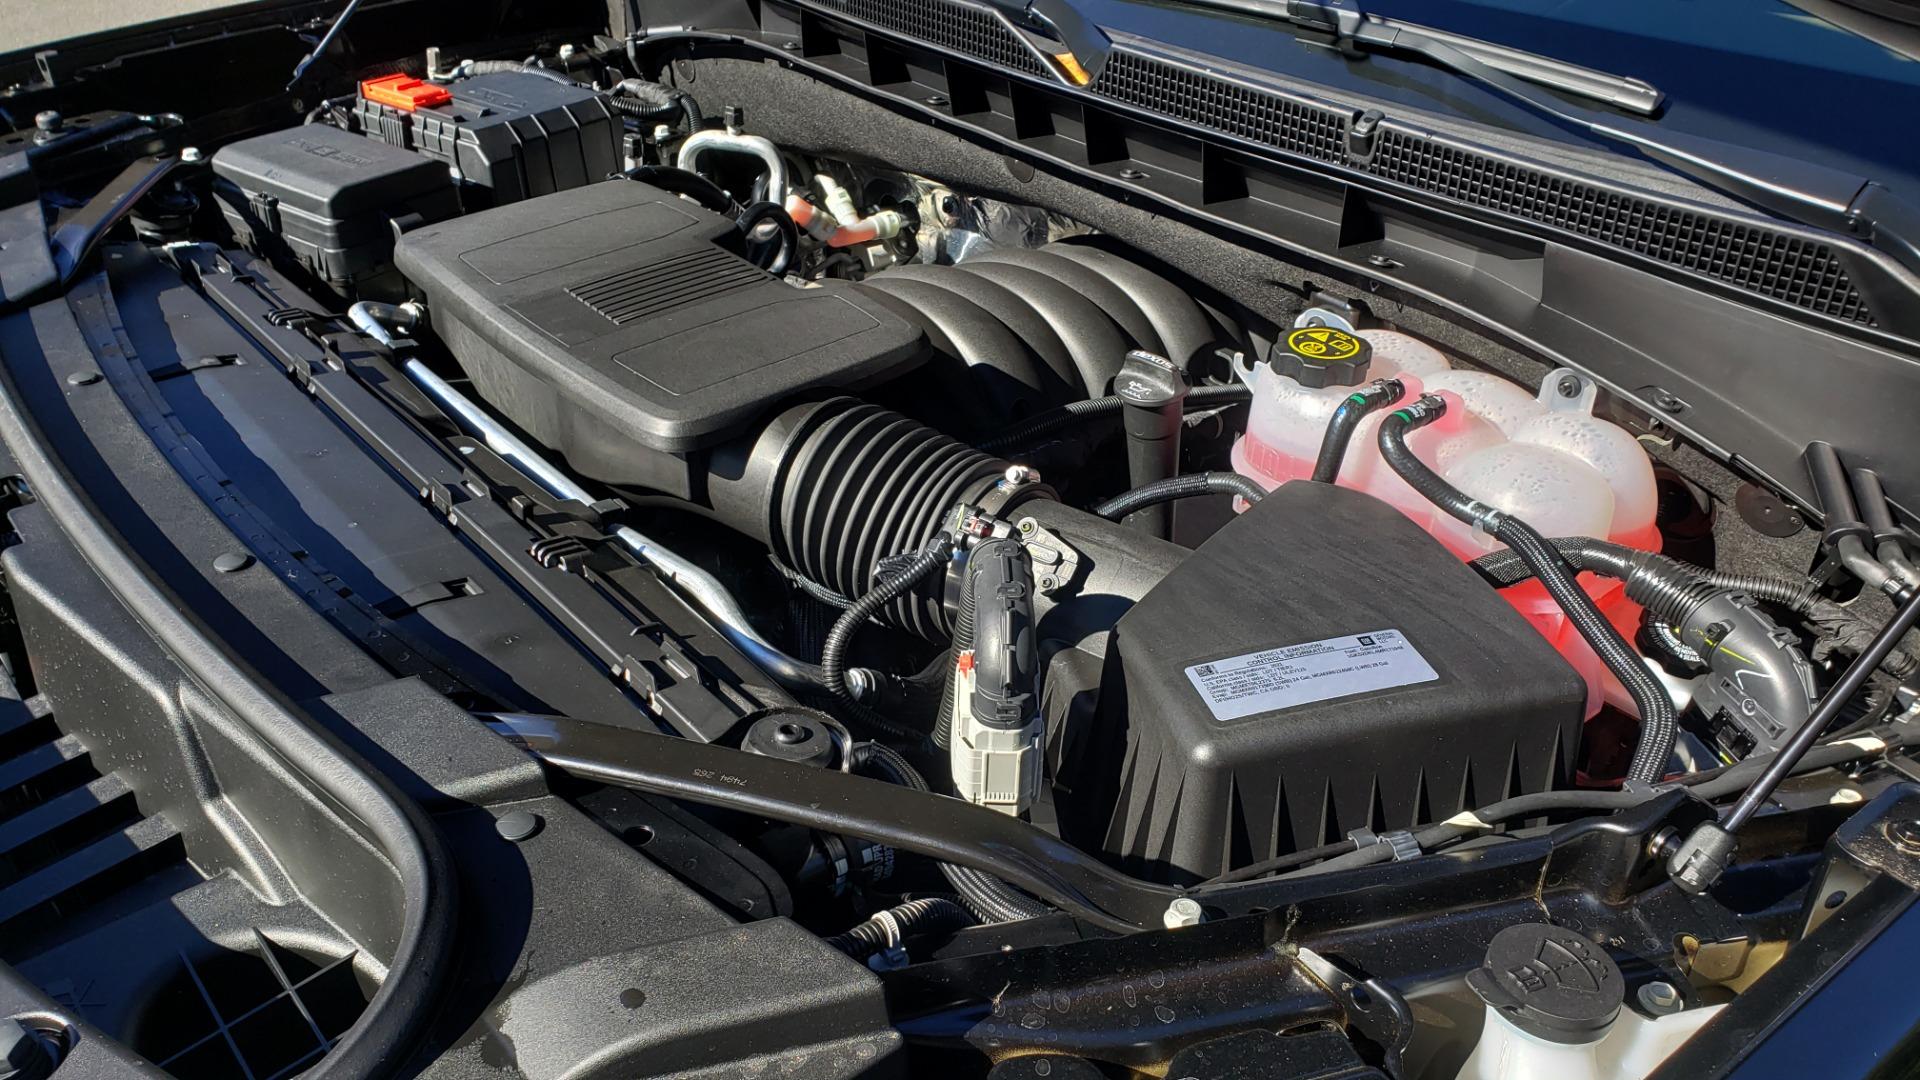 Used 2021 GMC YUKON DENALI PREMIUM 4WD / NAV / ADVANCED TECH / ENTERTAINMENT for sale Sold at Formula Imports in Charlotte NC 28227 16